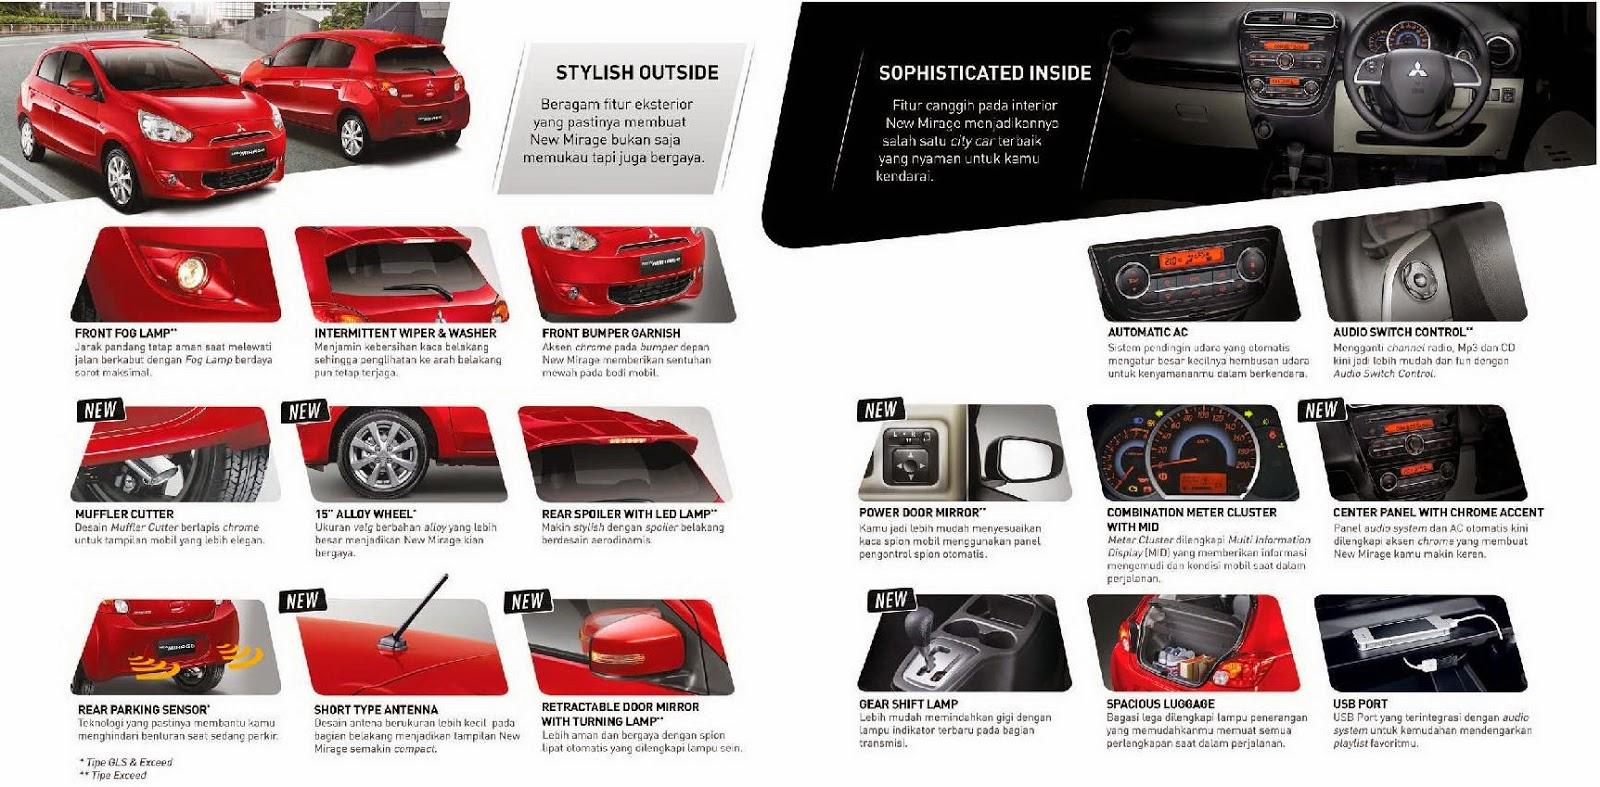 Brosur tipe Mobil Mitsubishi New Mirage Sport 2015